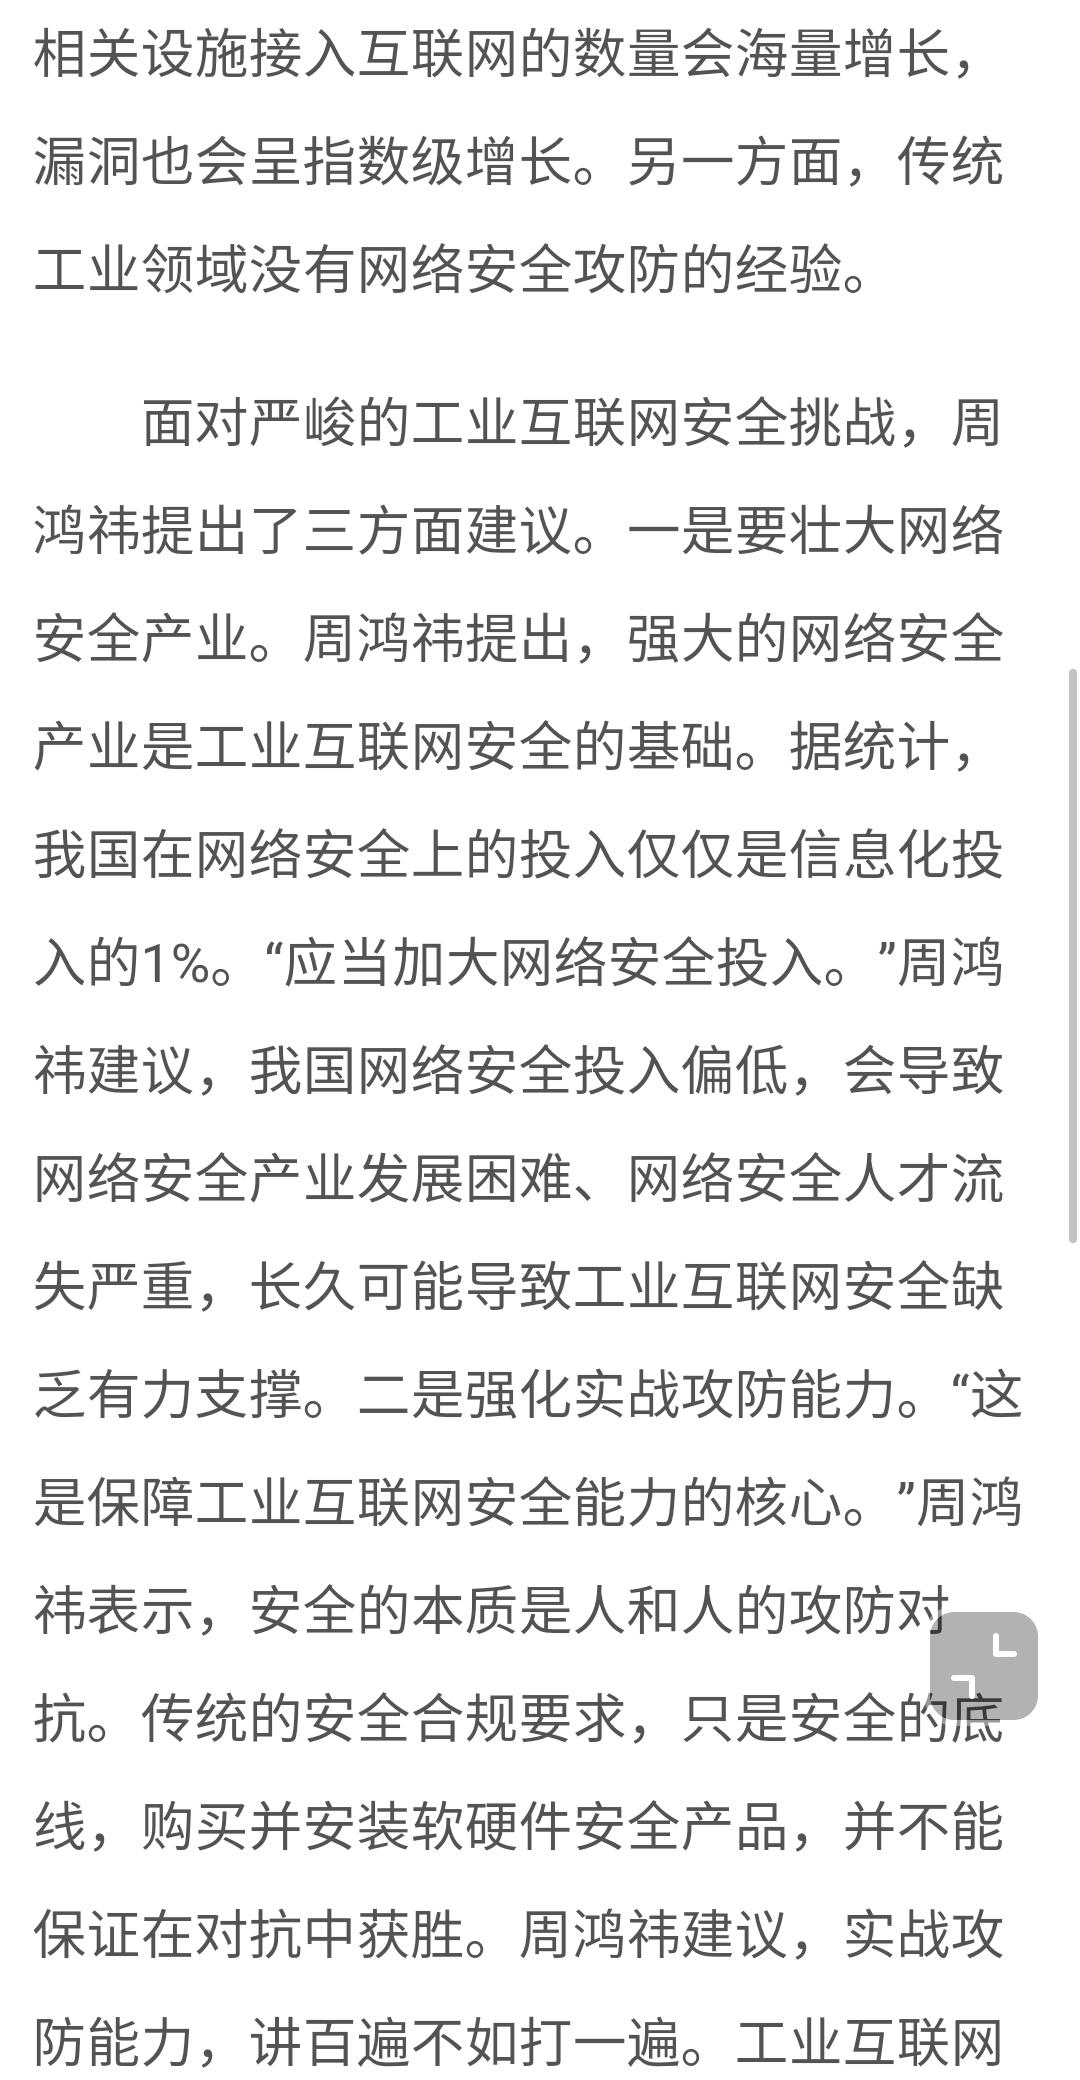 Screenshot_2020-05-23-04-51-50.png